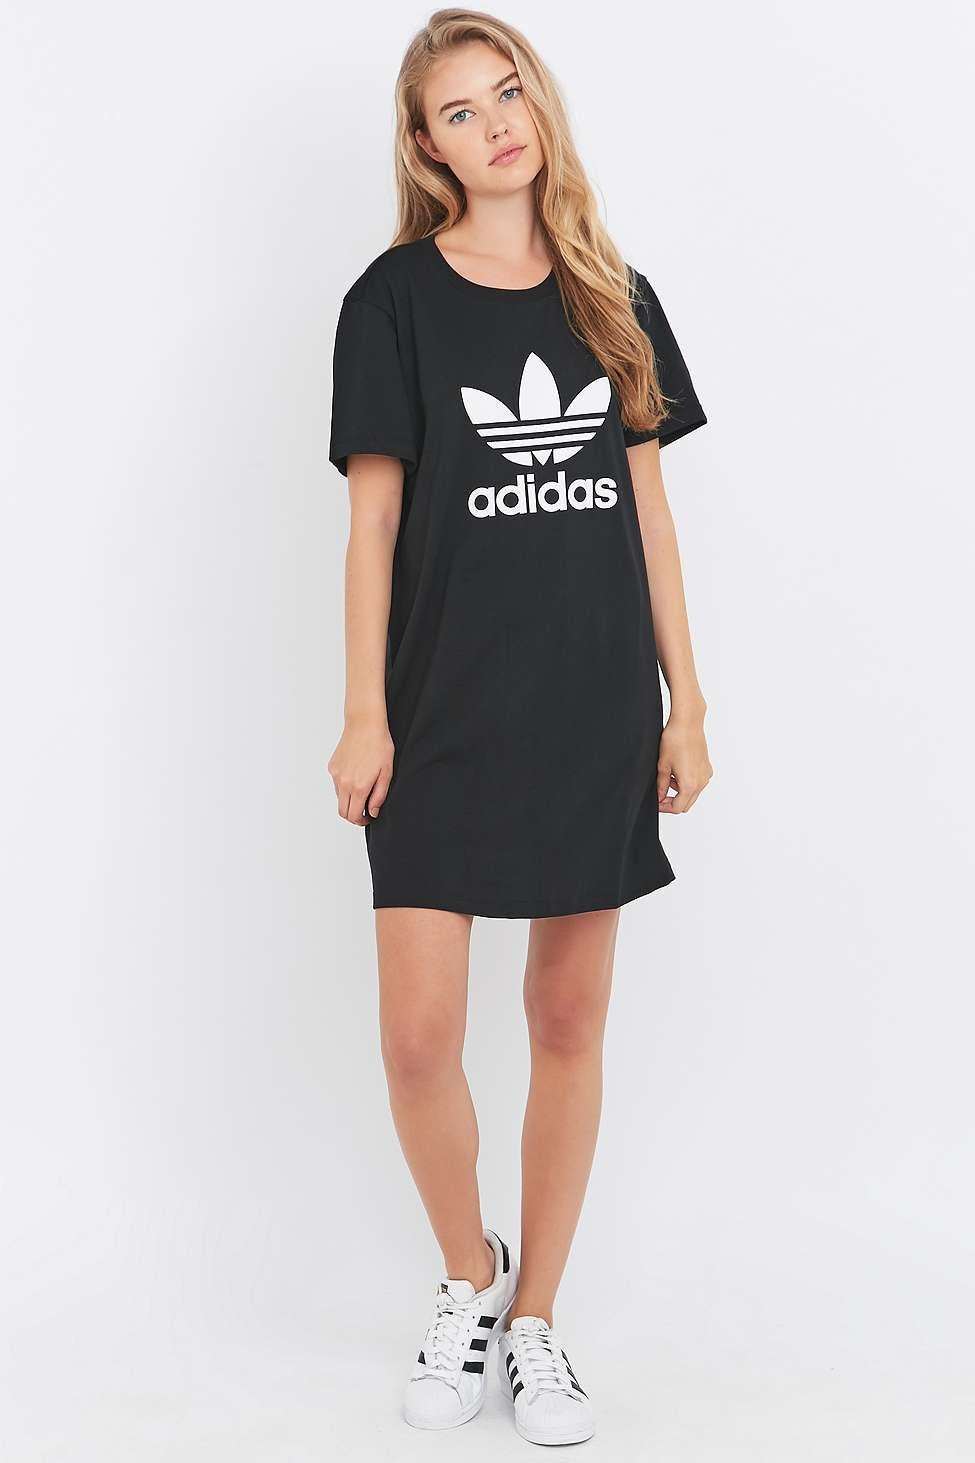 Orphan black t shirt uk - Adidas Originals Black Trefoil T Shirt Dress Urban Outfitters